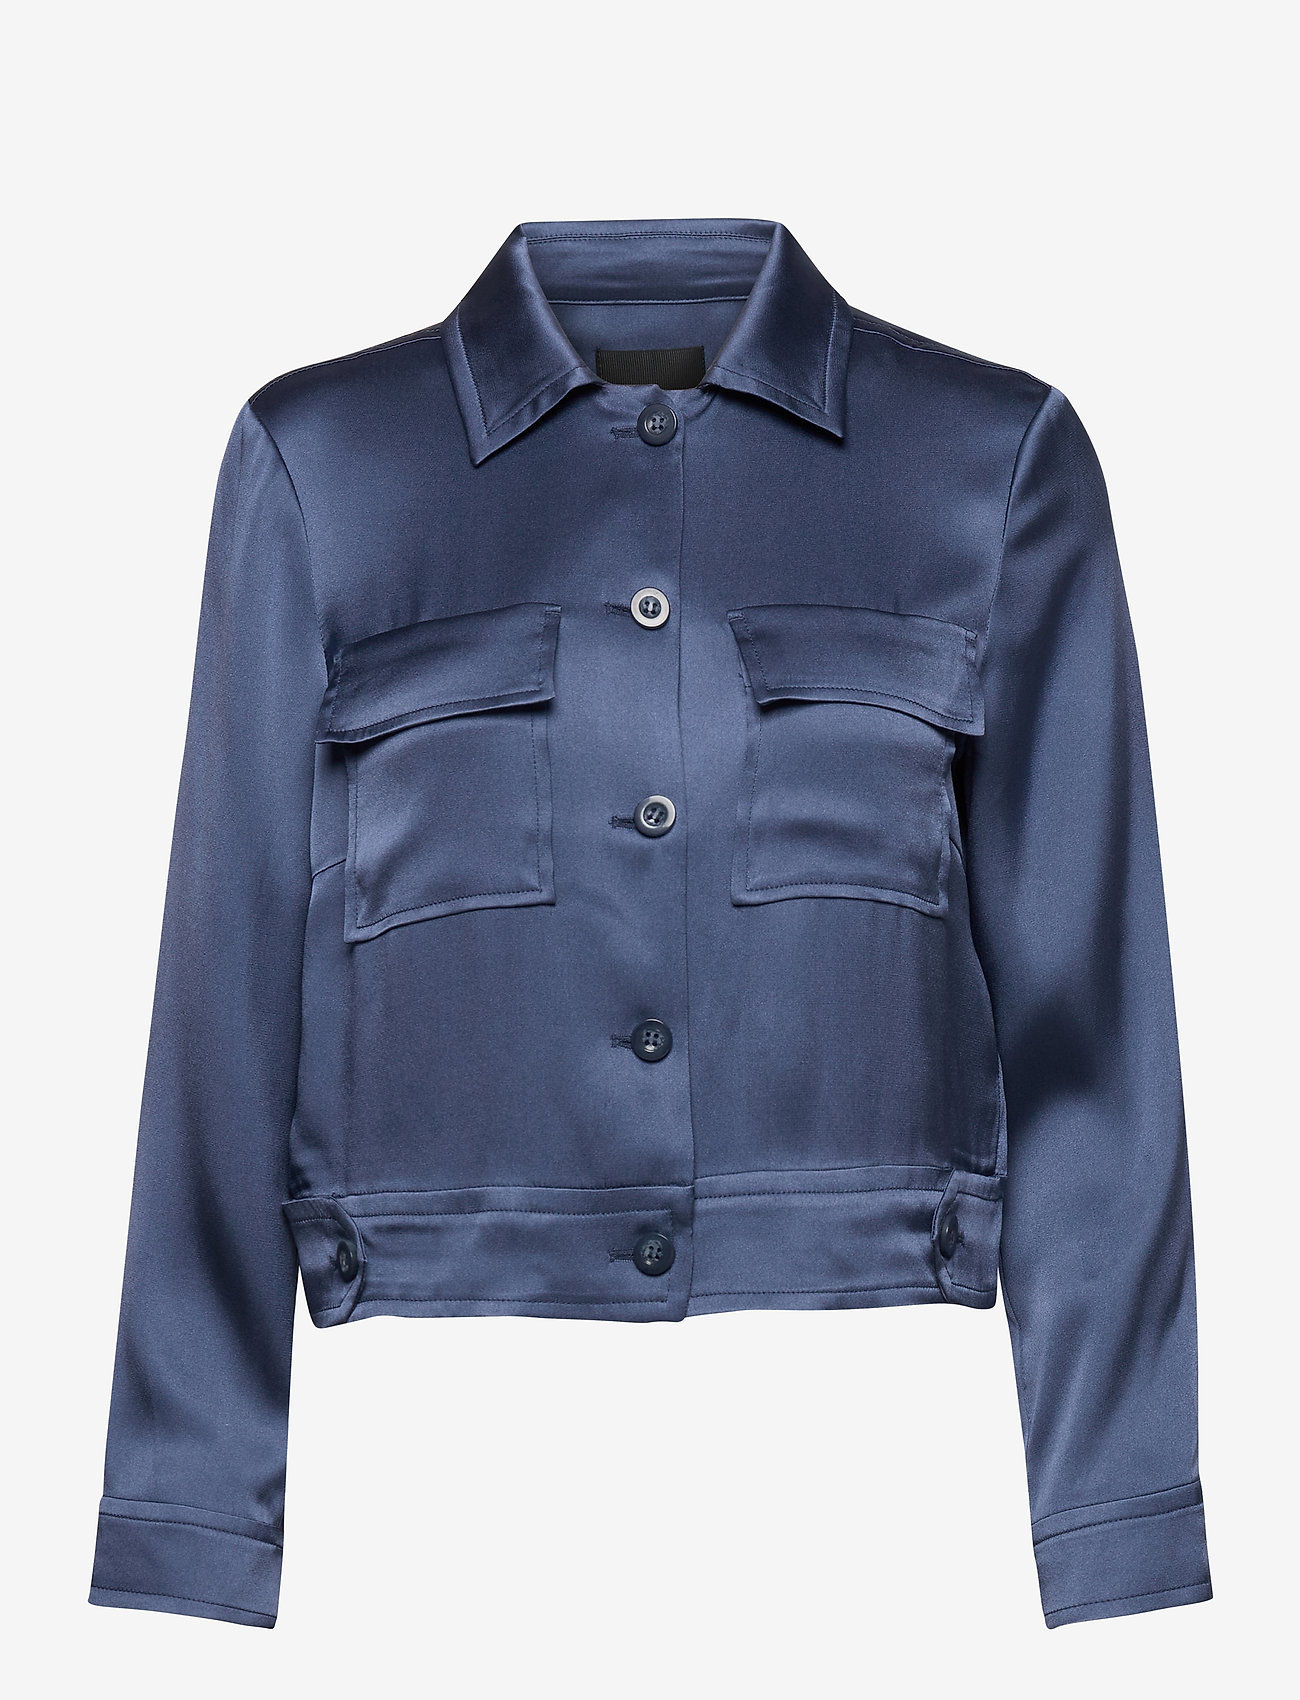 SAND - Double Silk - Kaela - lichte jassen - medium blue - 0